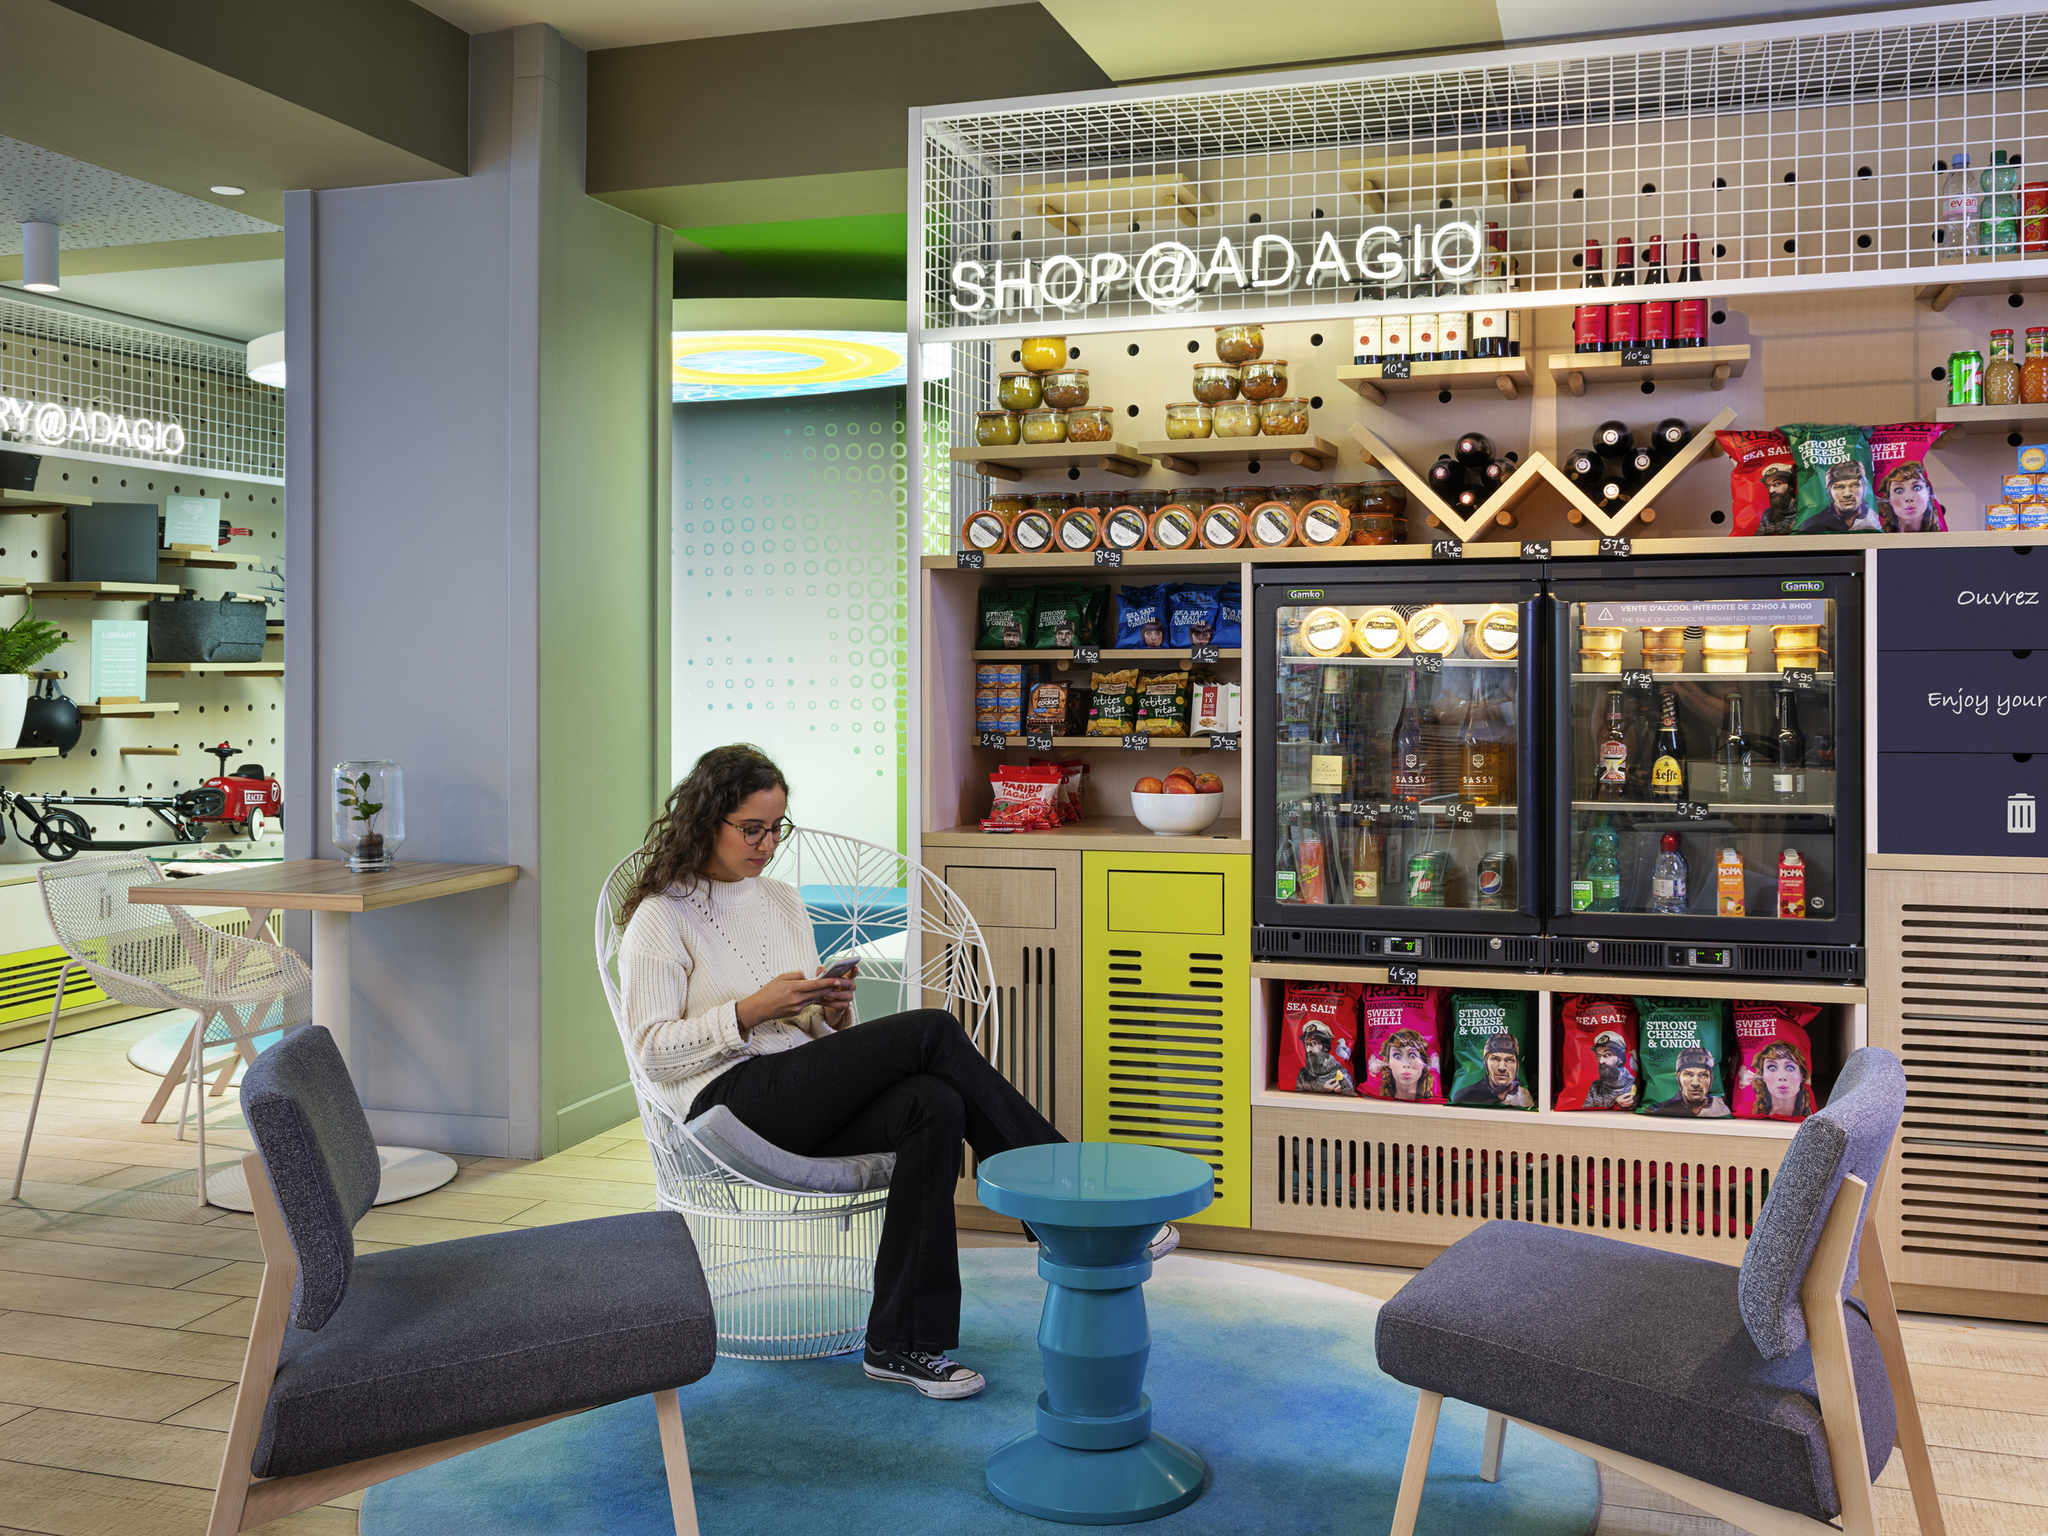 inter hotel de france r servation gratuite sur viamichelin. Black Bedroom Furniture Sets. Home Design Ideas